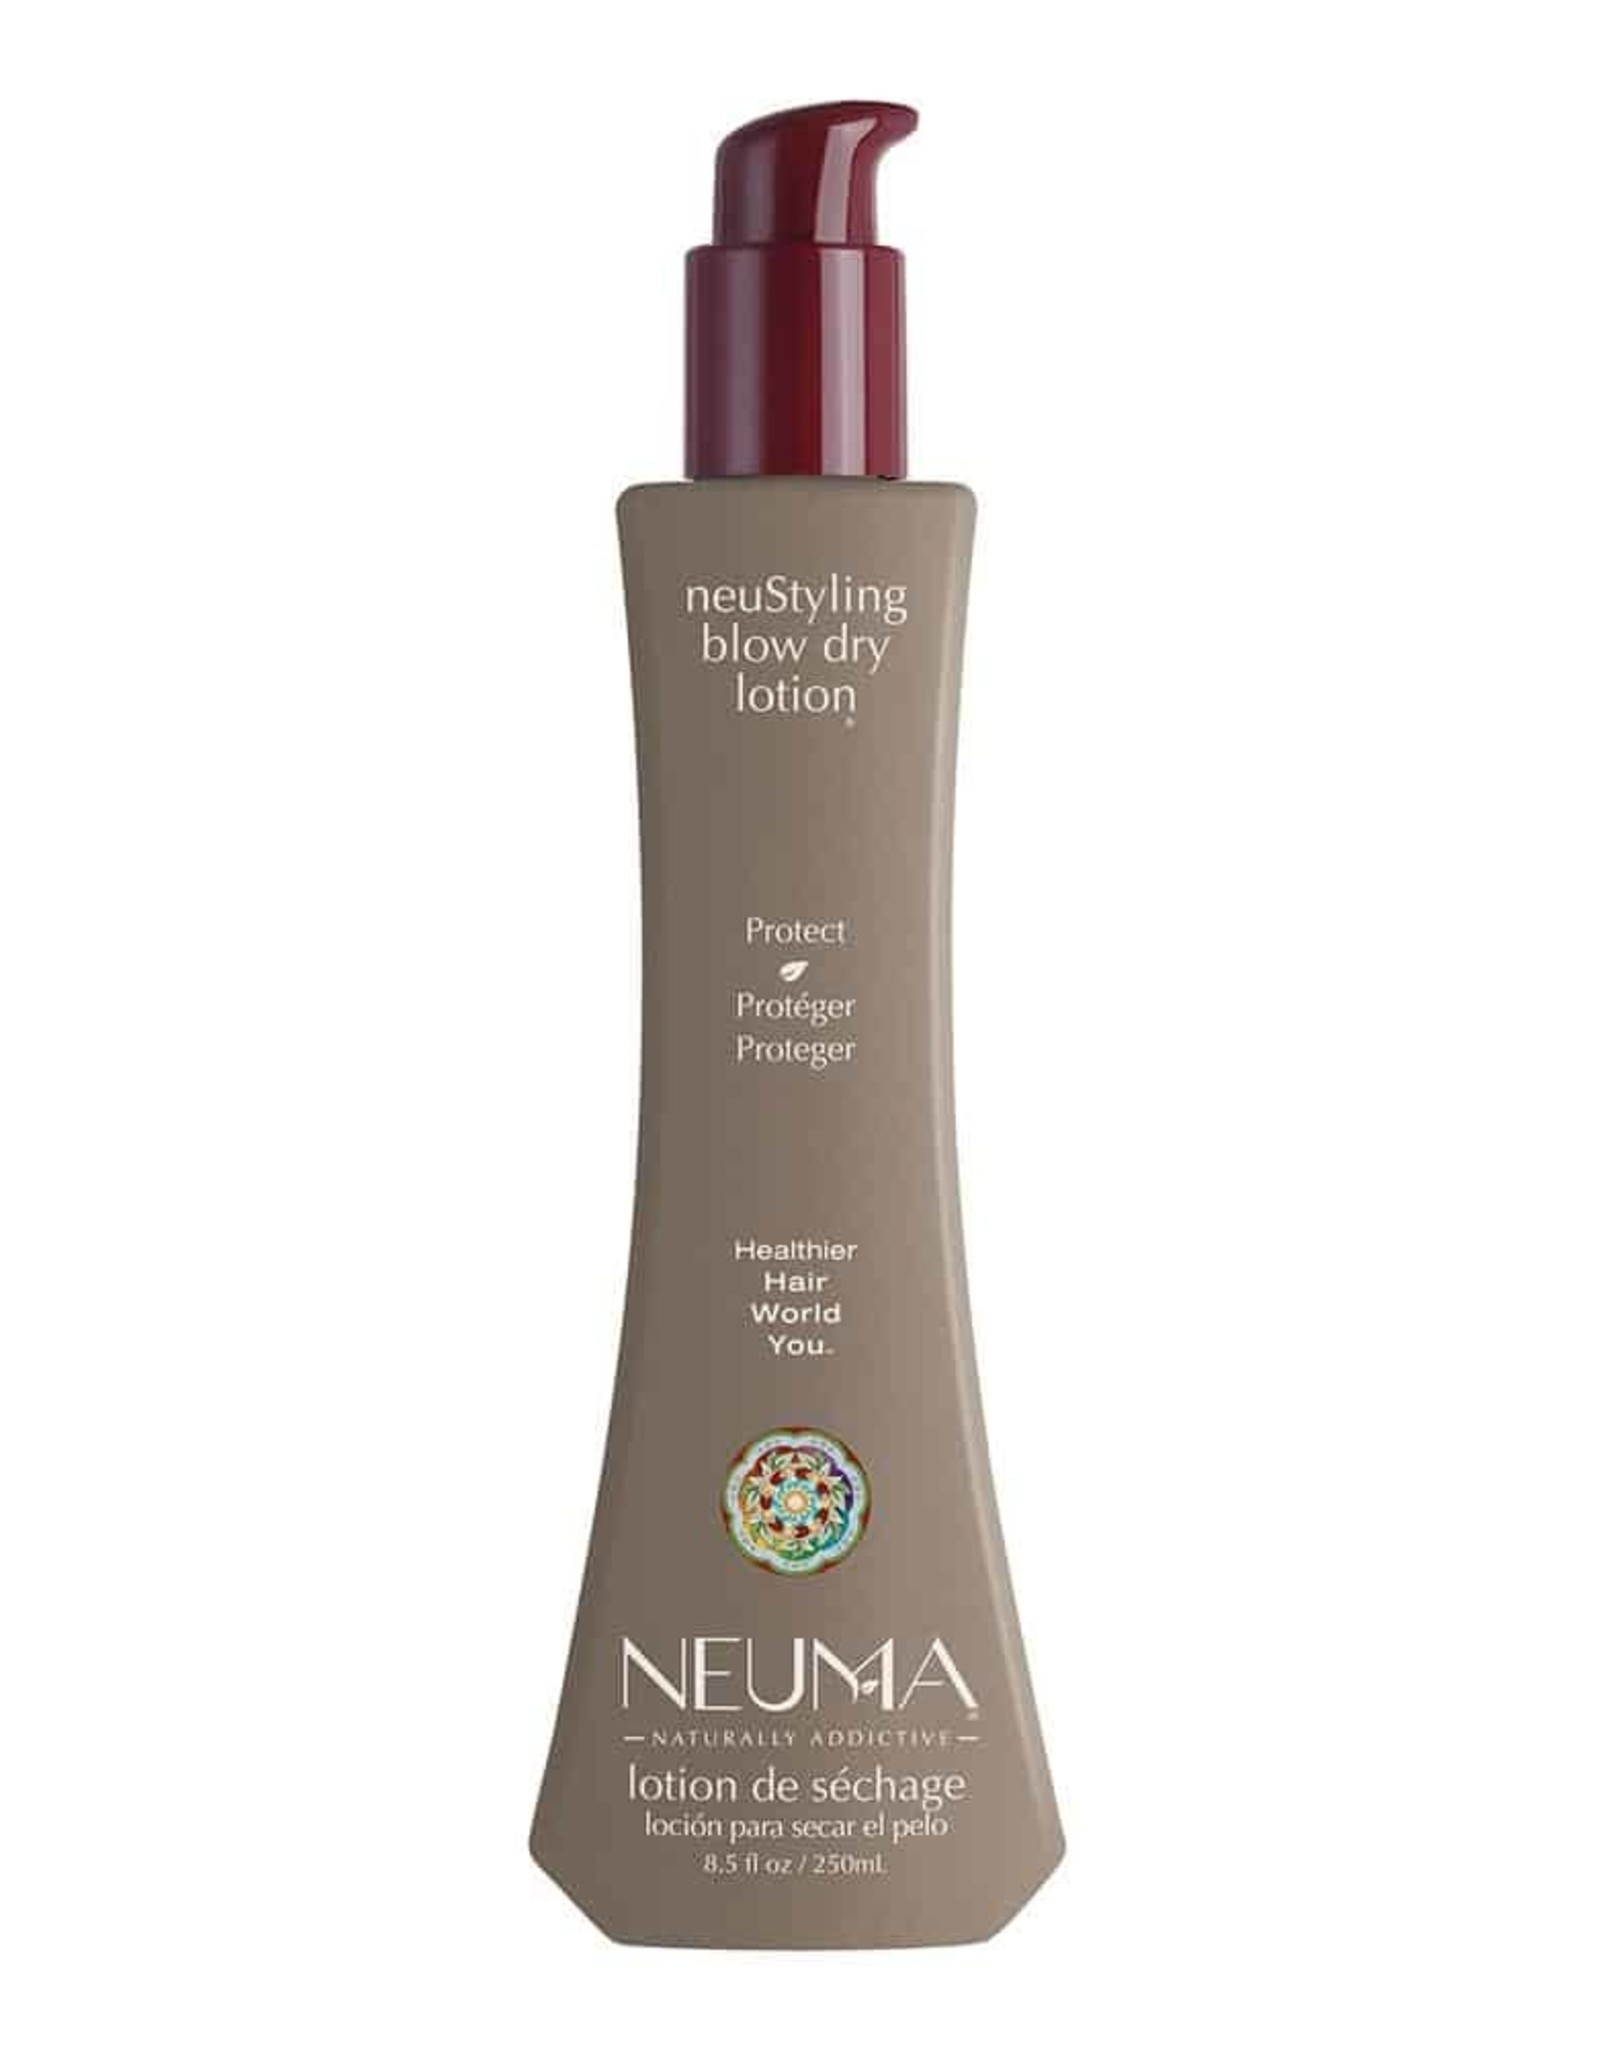 Neuma NeuStyling Blow Dry Lotion